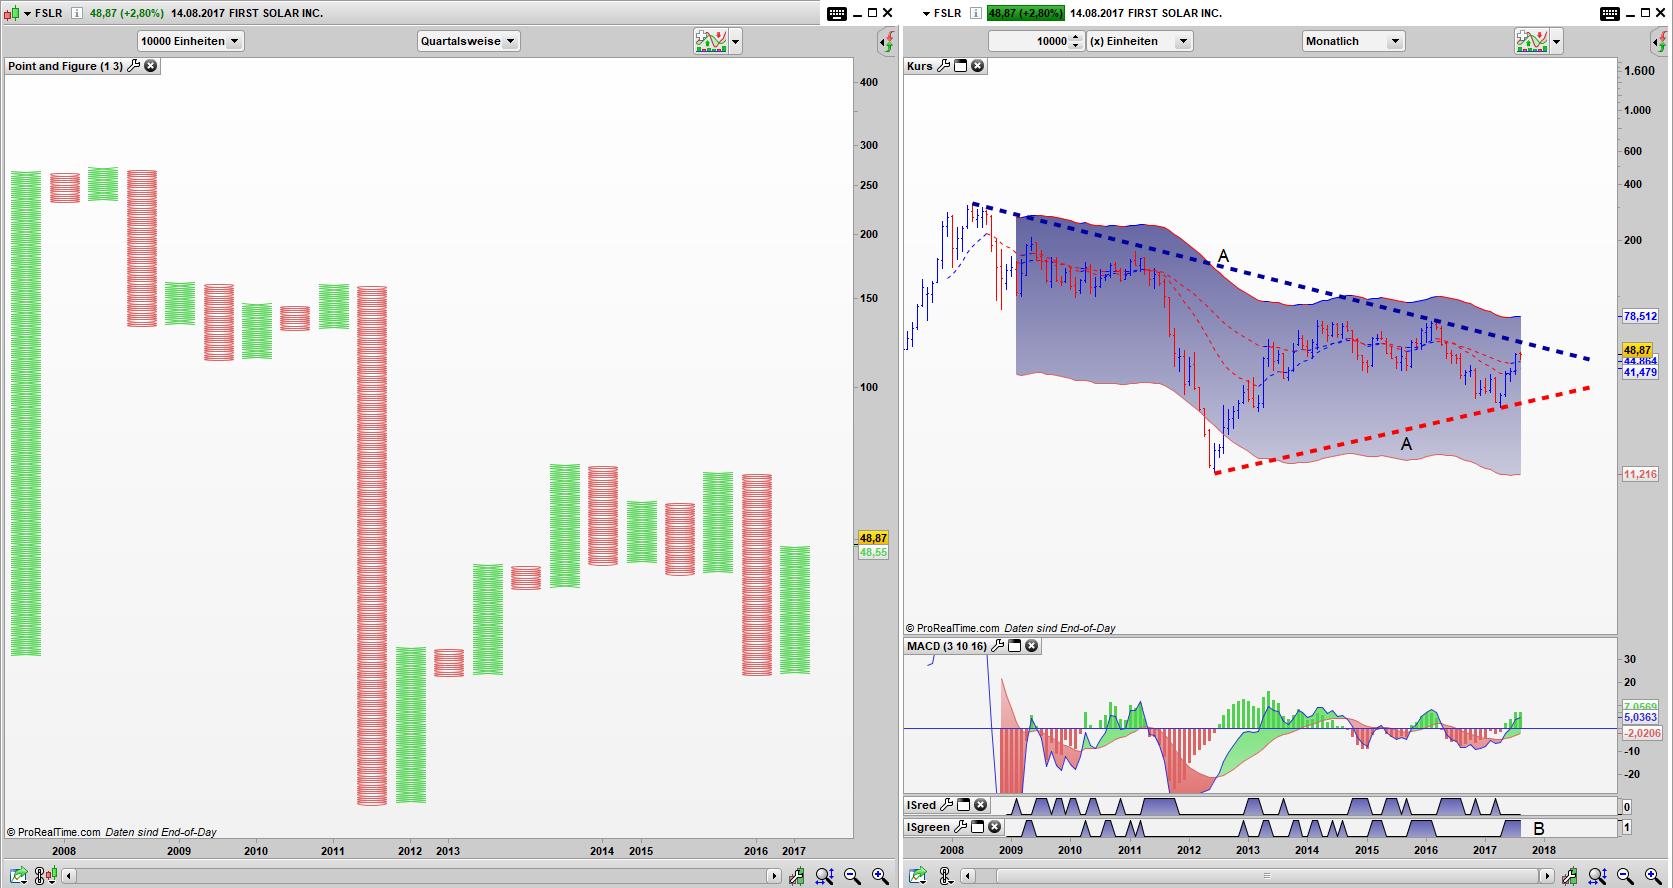 FSLR Point and Figure Quartals Chart, Bar Monats Chart: Noch regieren die Bären im PaF Chart, doch im Bar Chart reift Hoffnung für die Bullen.